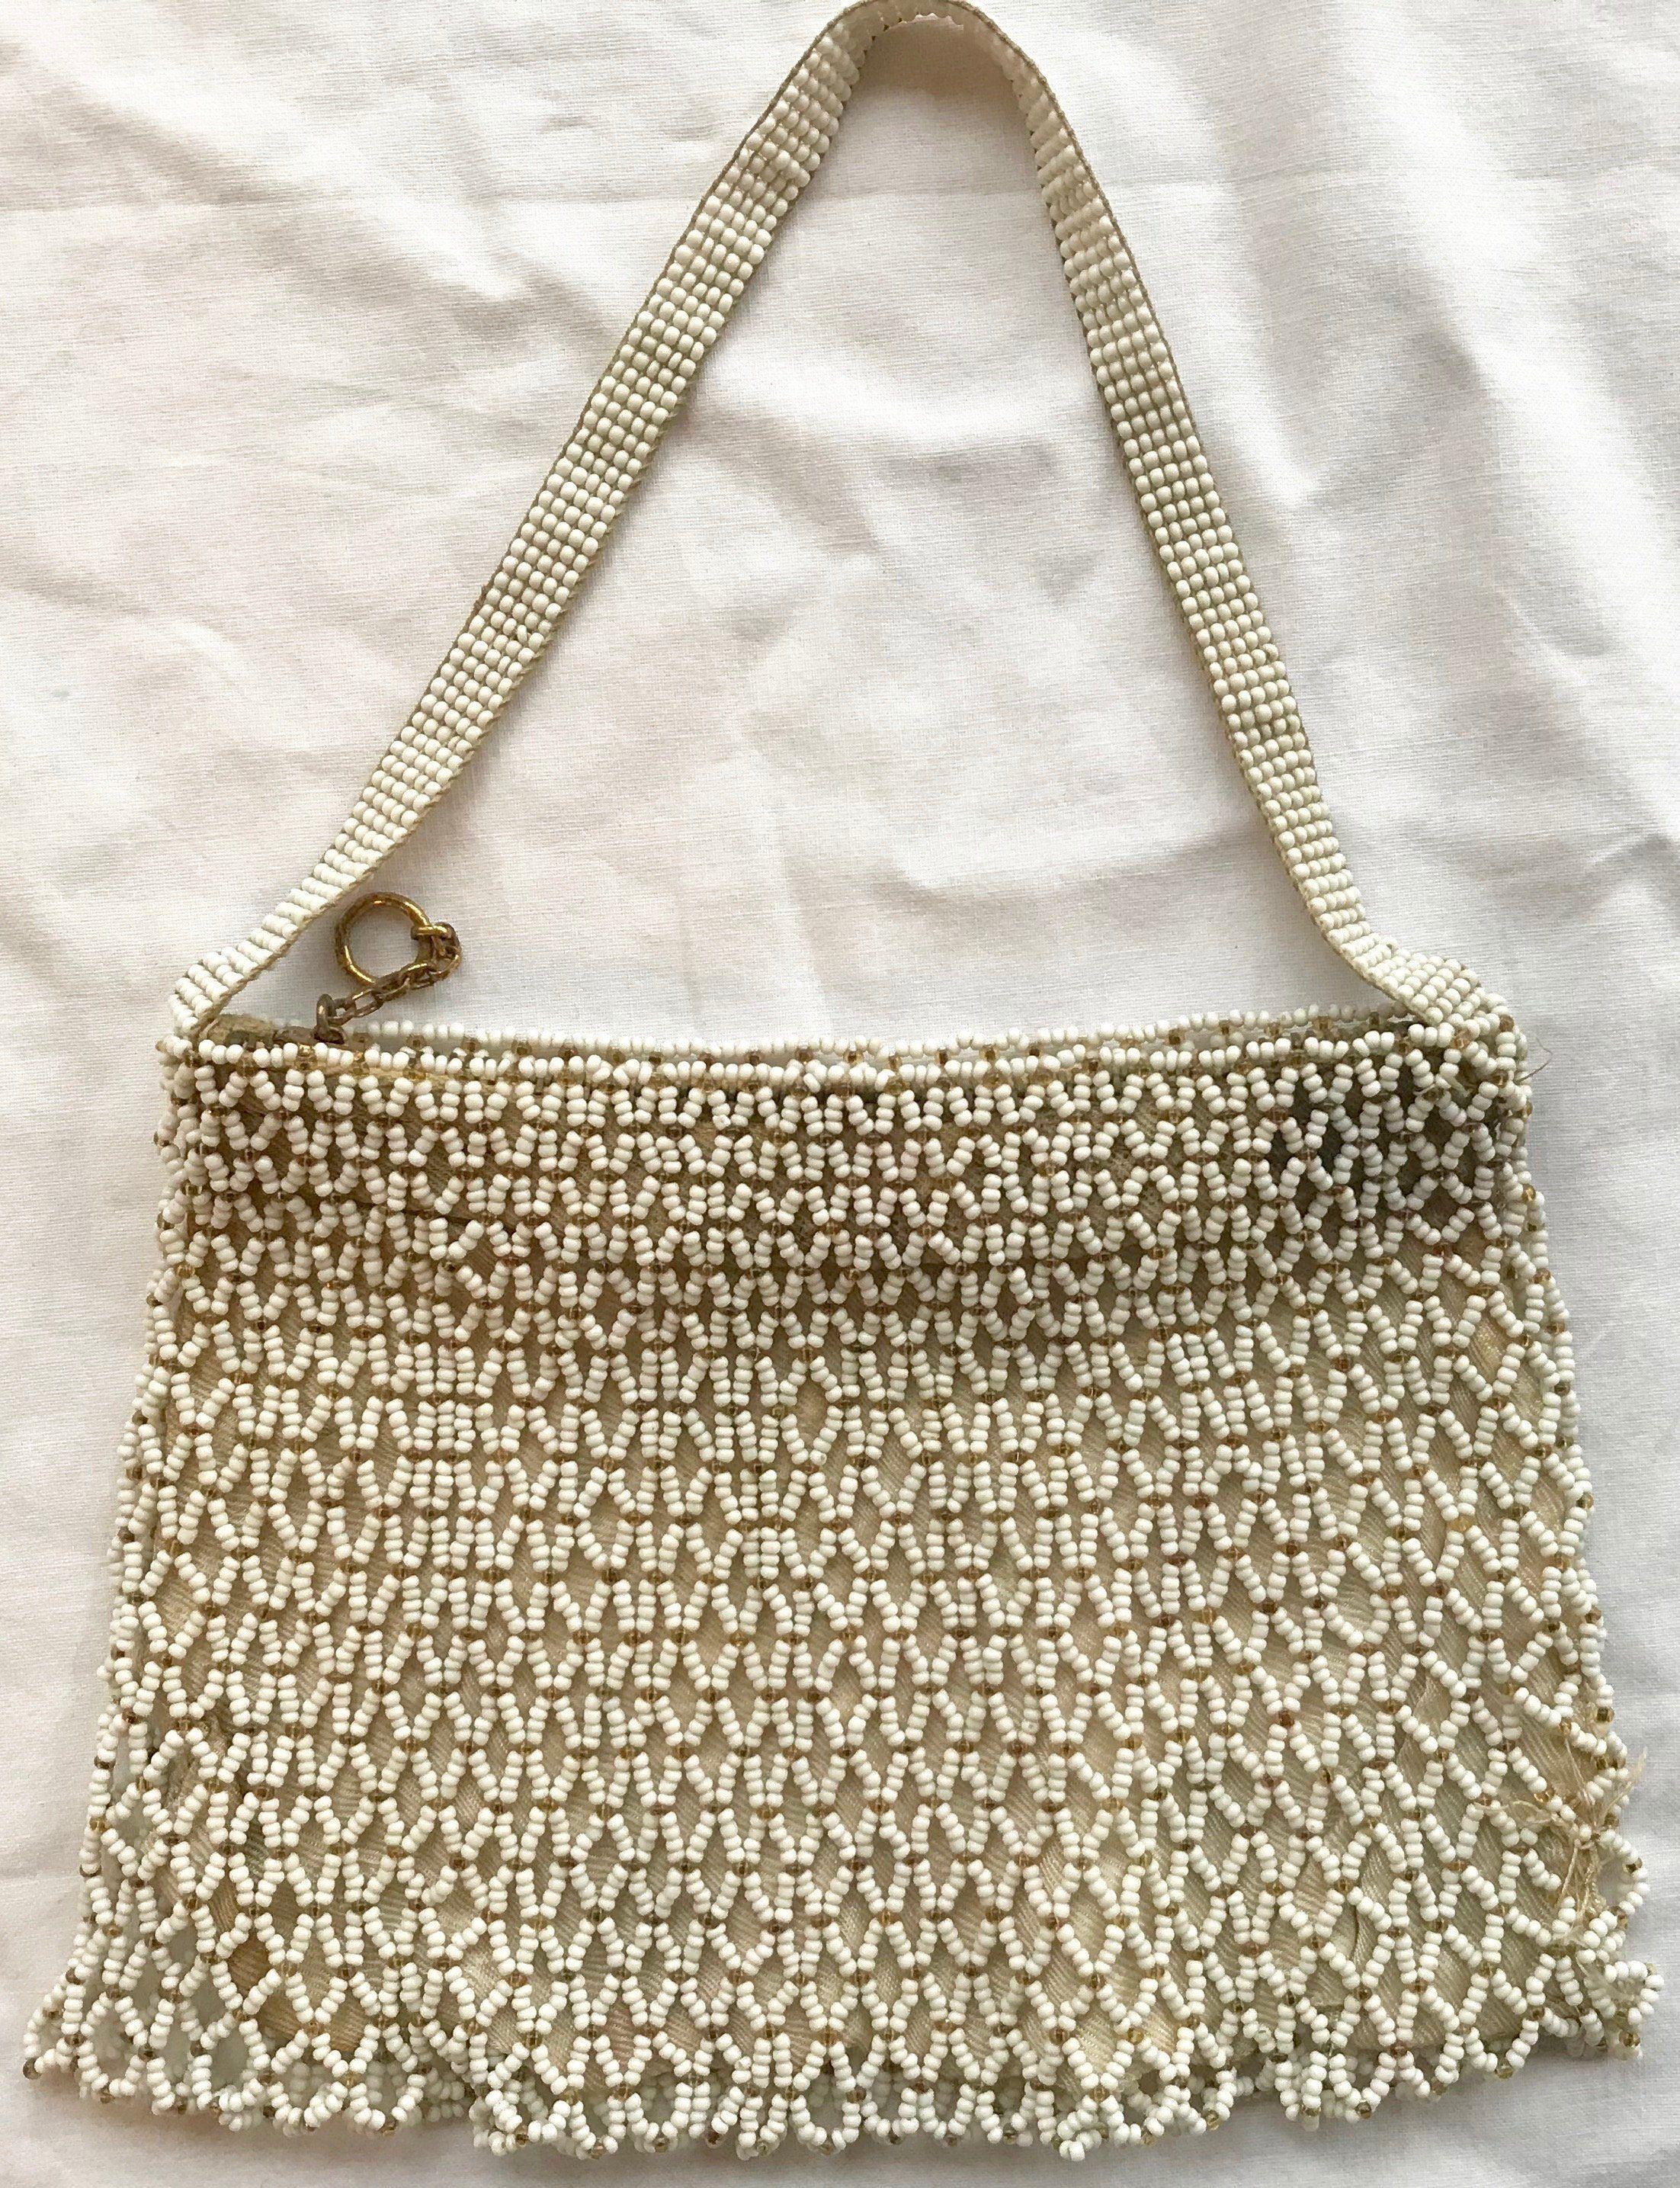 Vintage 1920s 1930s 1940s White Beaded Handbag Evening Bag Purse by  SweetLittleVillage on Etsy d6c6a87bd0563